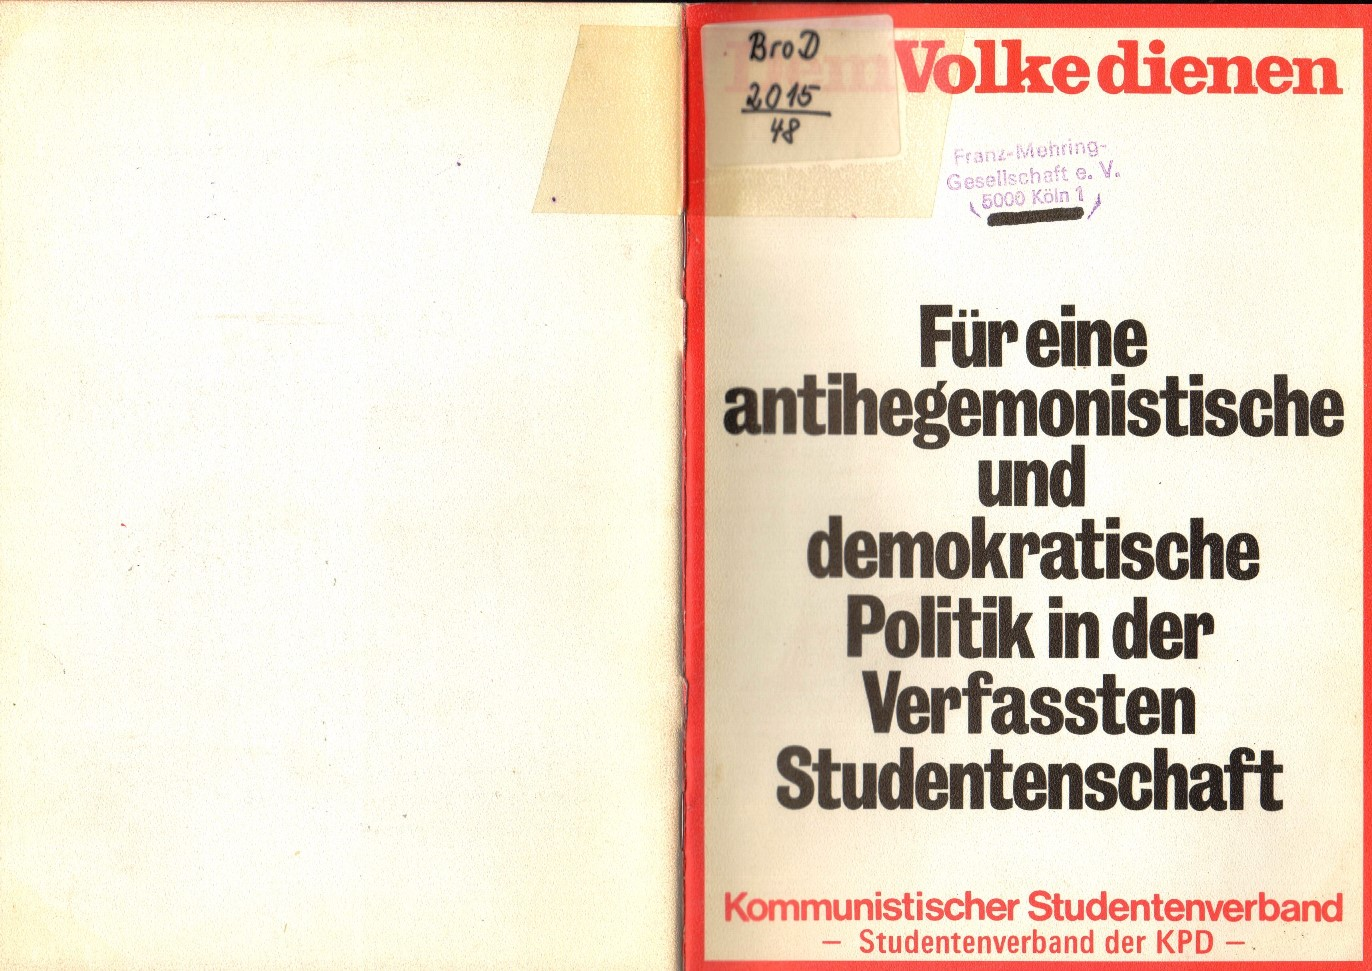 KSV_1976_Verfasste_Studentenschaft_01